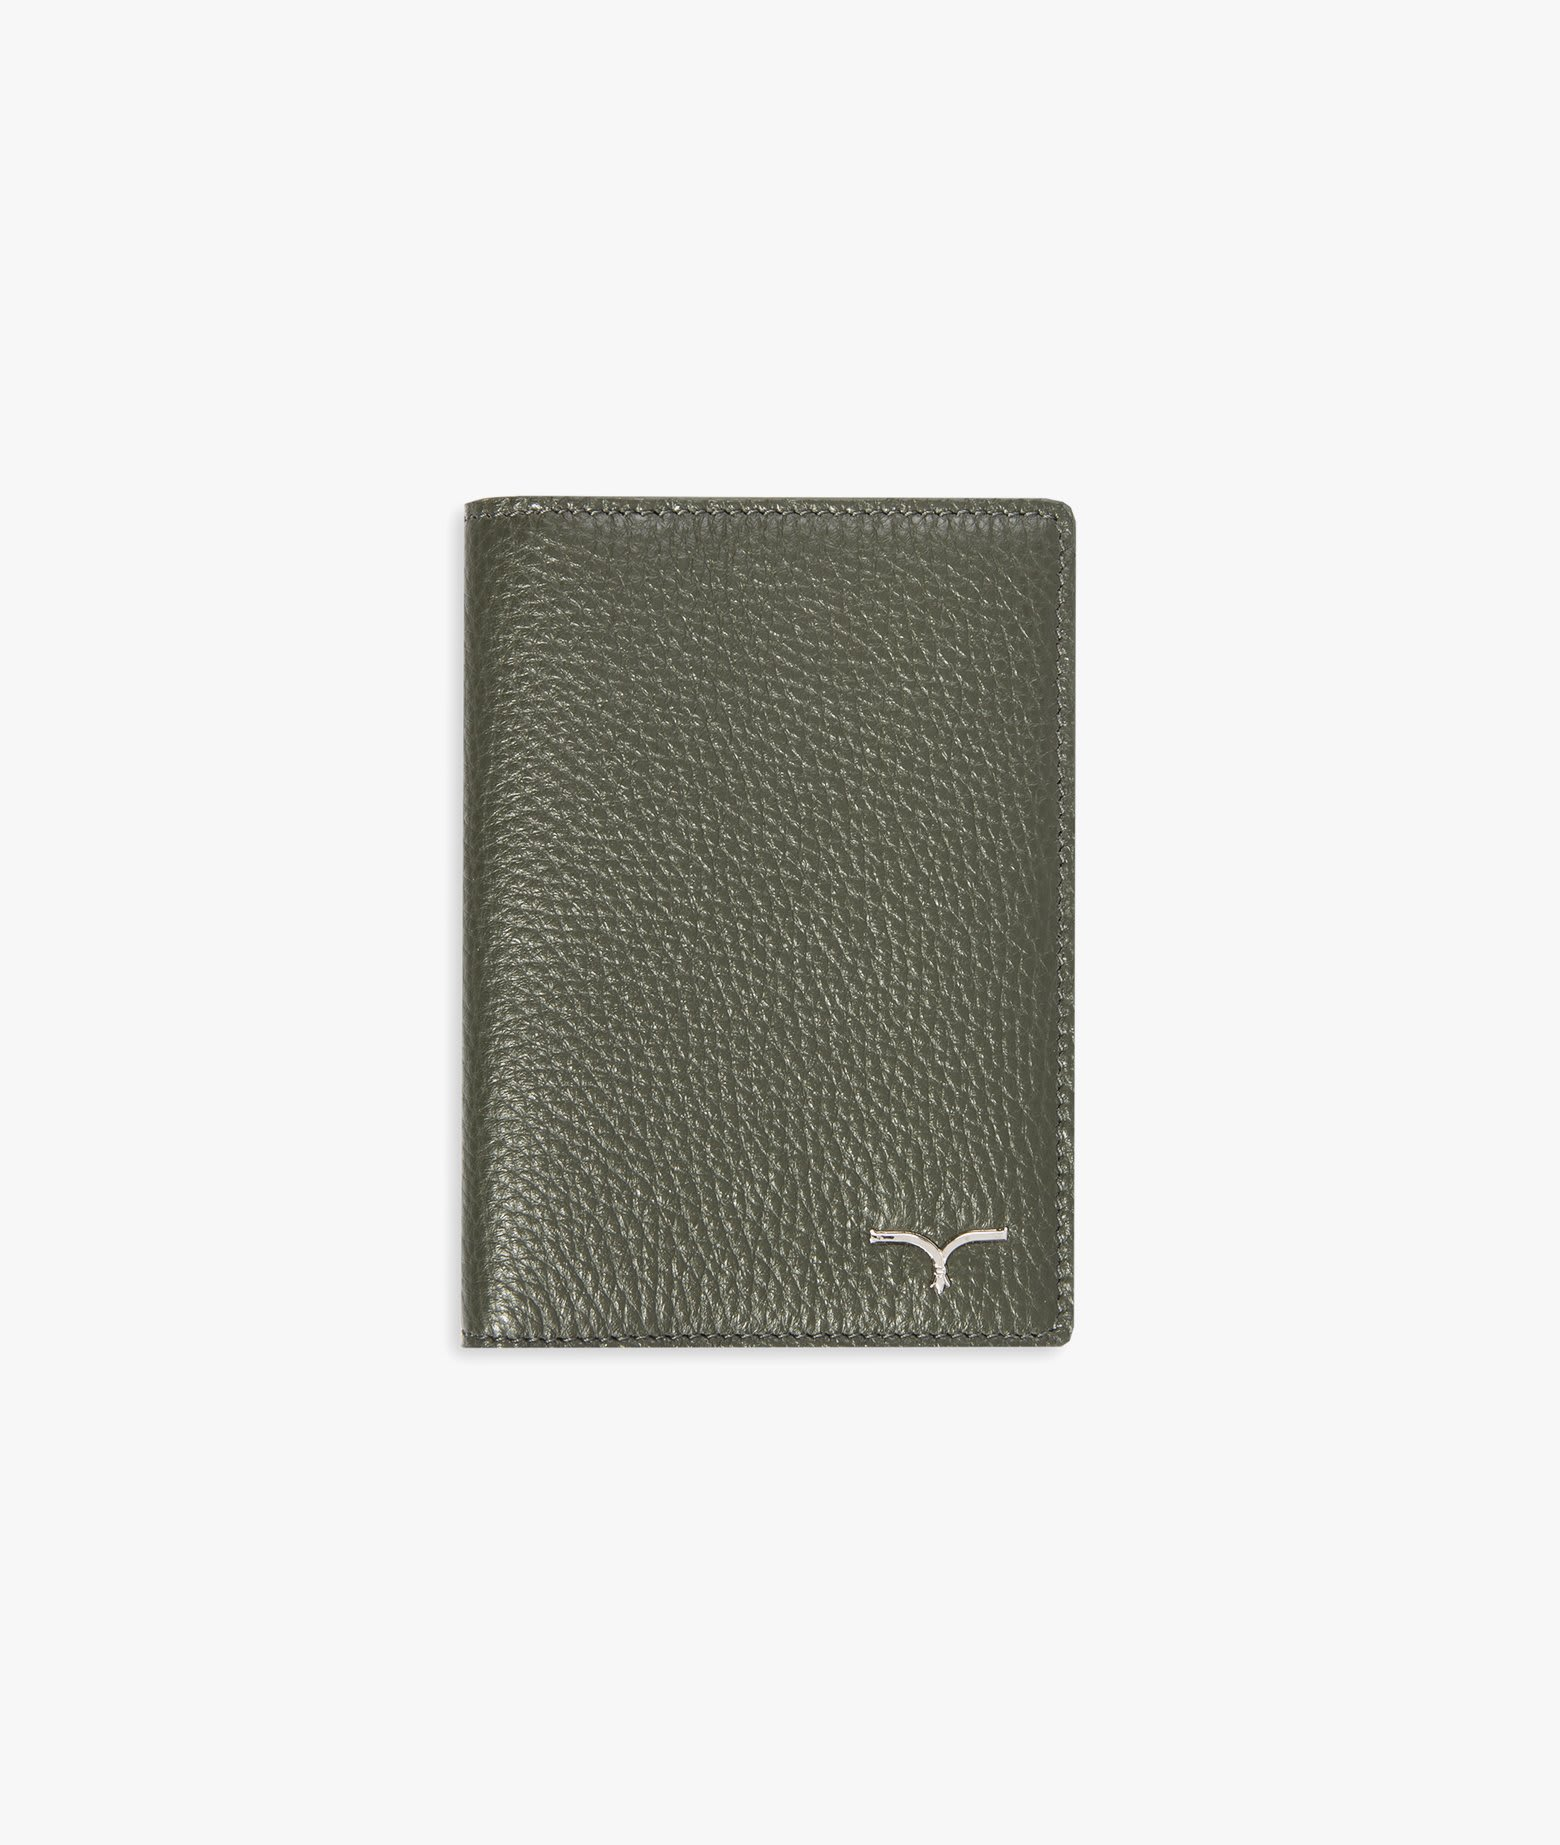 Passport Cover concorde